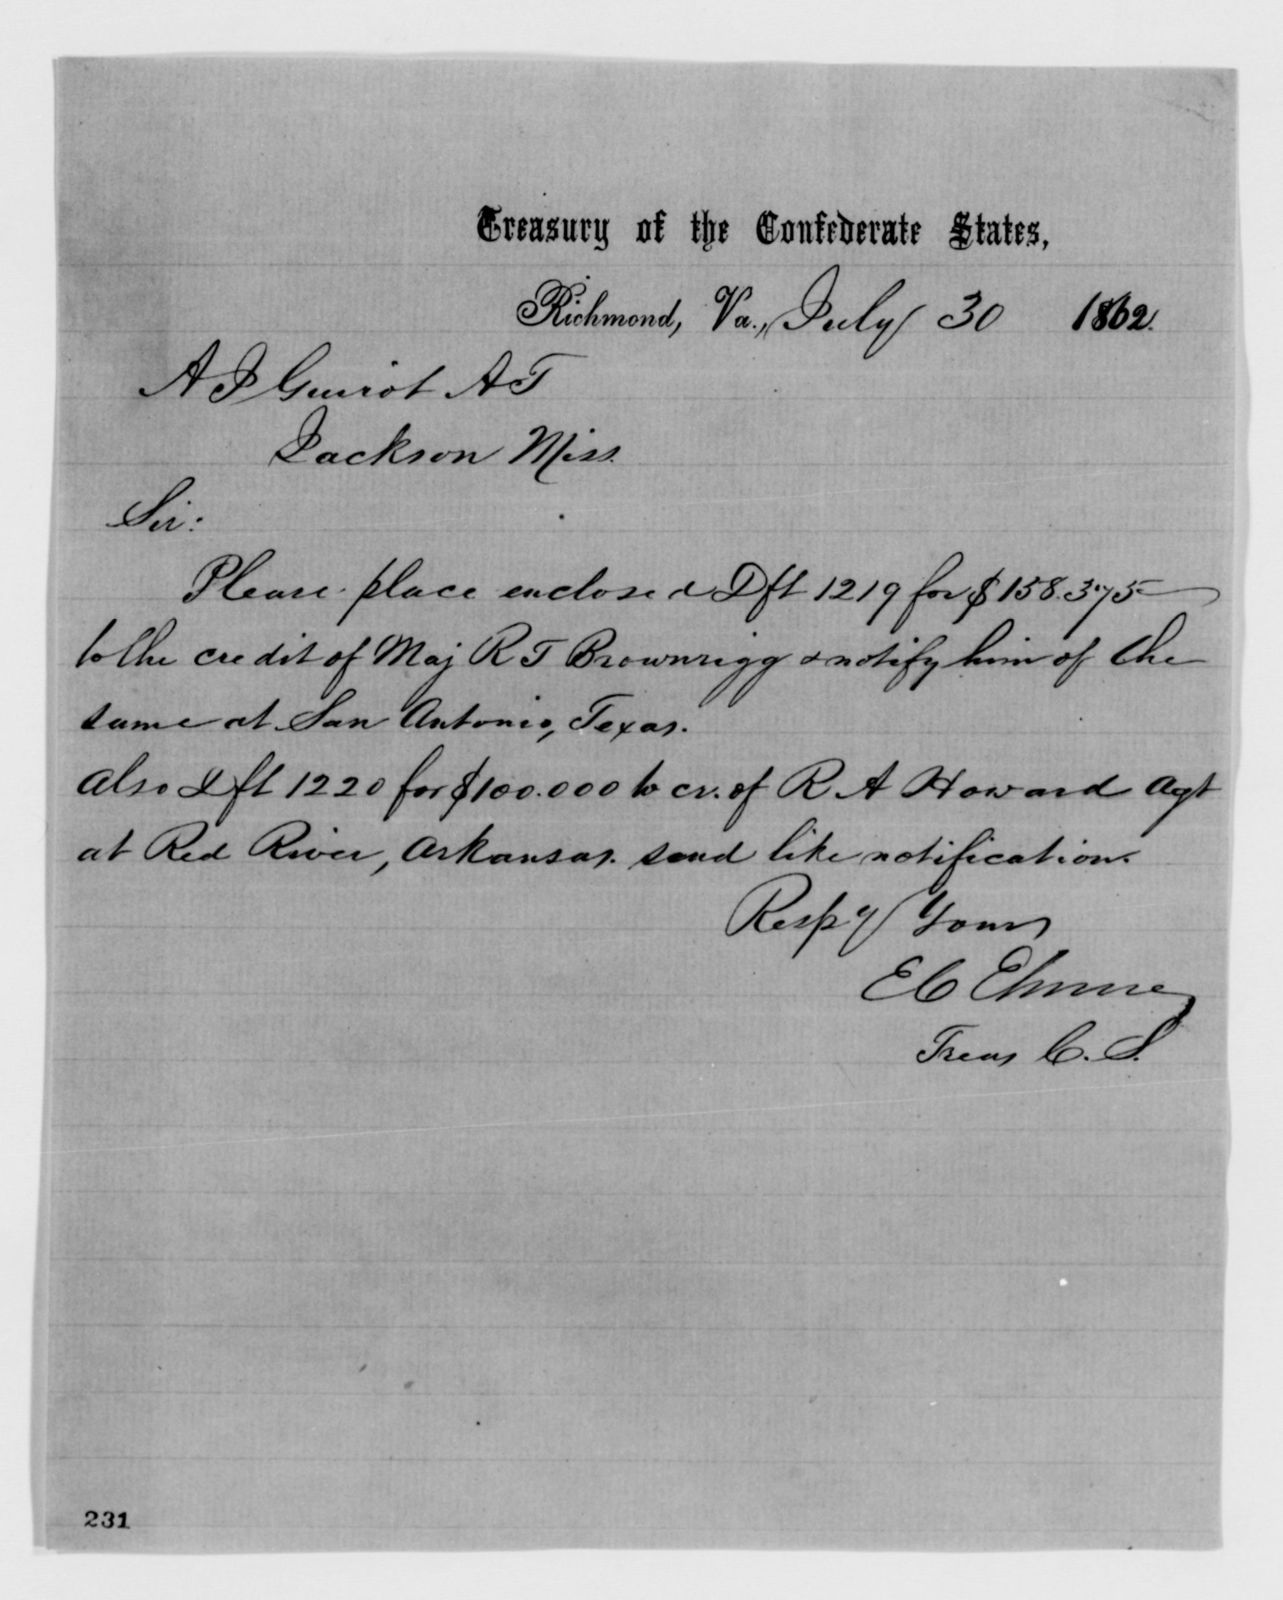 Confederate States of America records: Microfilm Reel 39